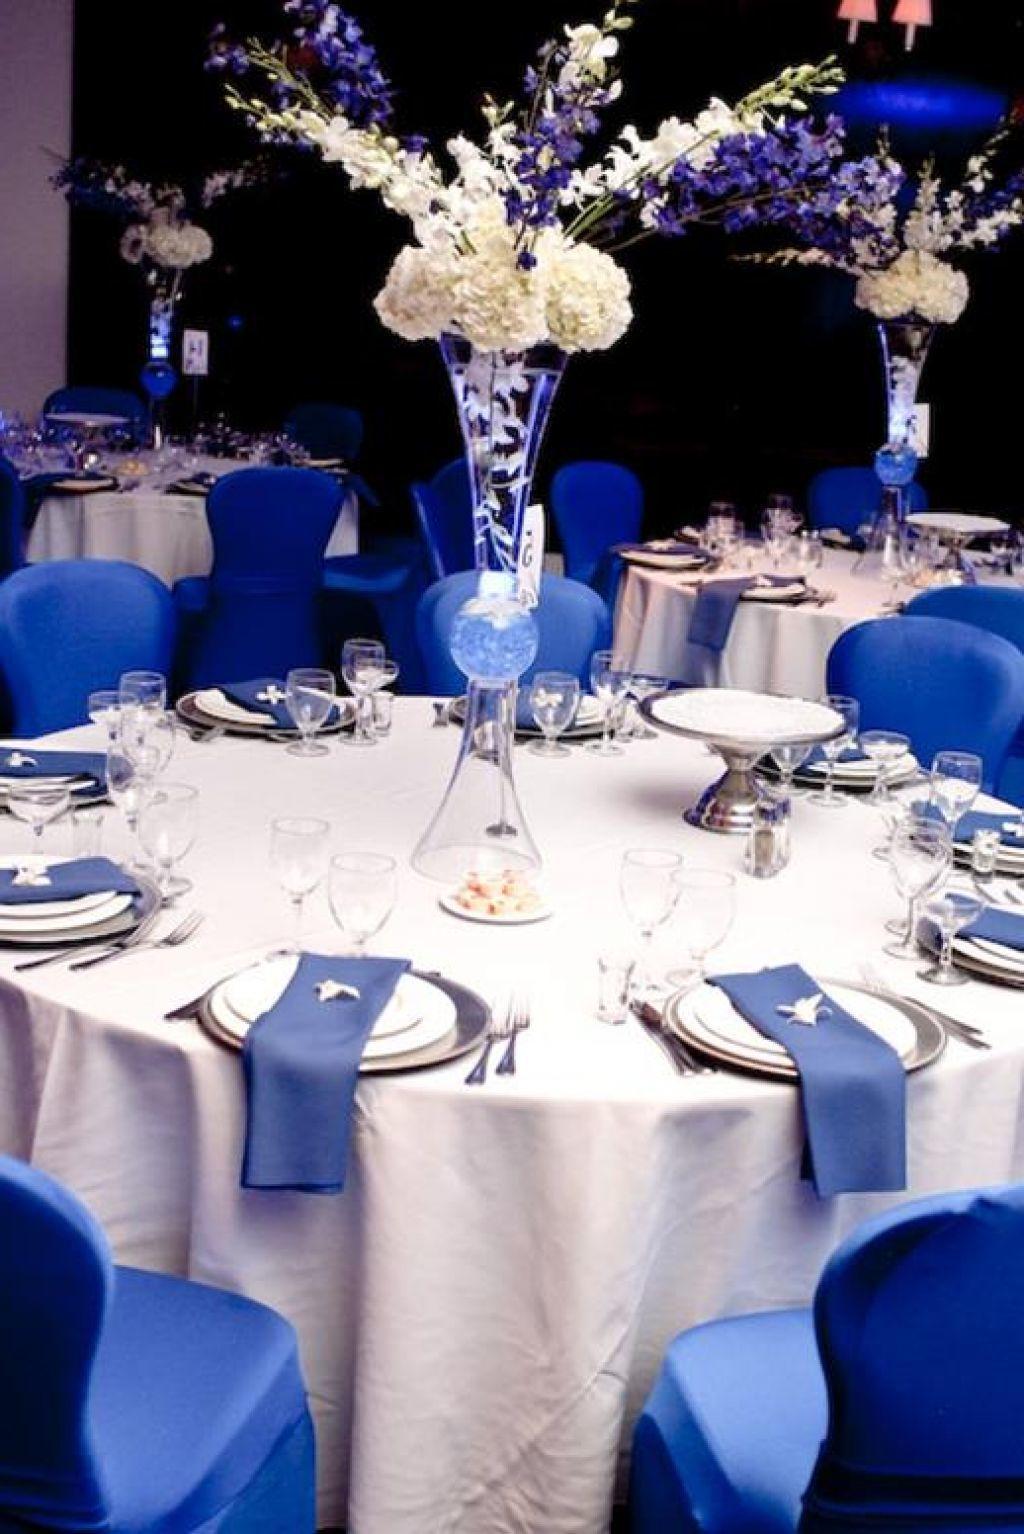 37 Fabulous Royal Blue Wedding Decorations Ideas Blue Wedding Decorations Blue Wedding Receptions Royal Blue Wedding Decorations